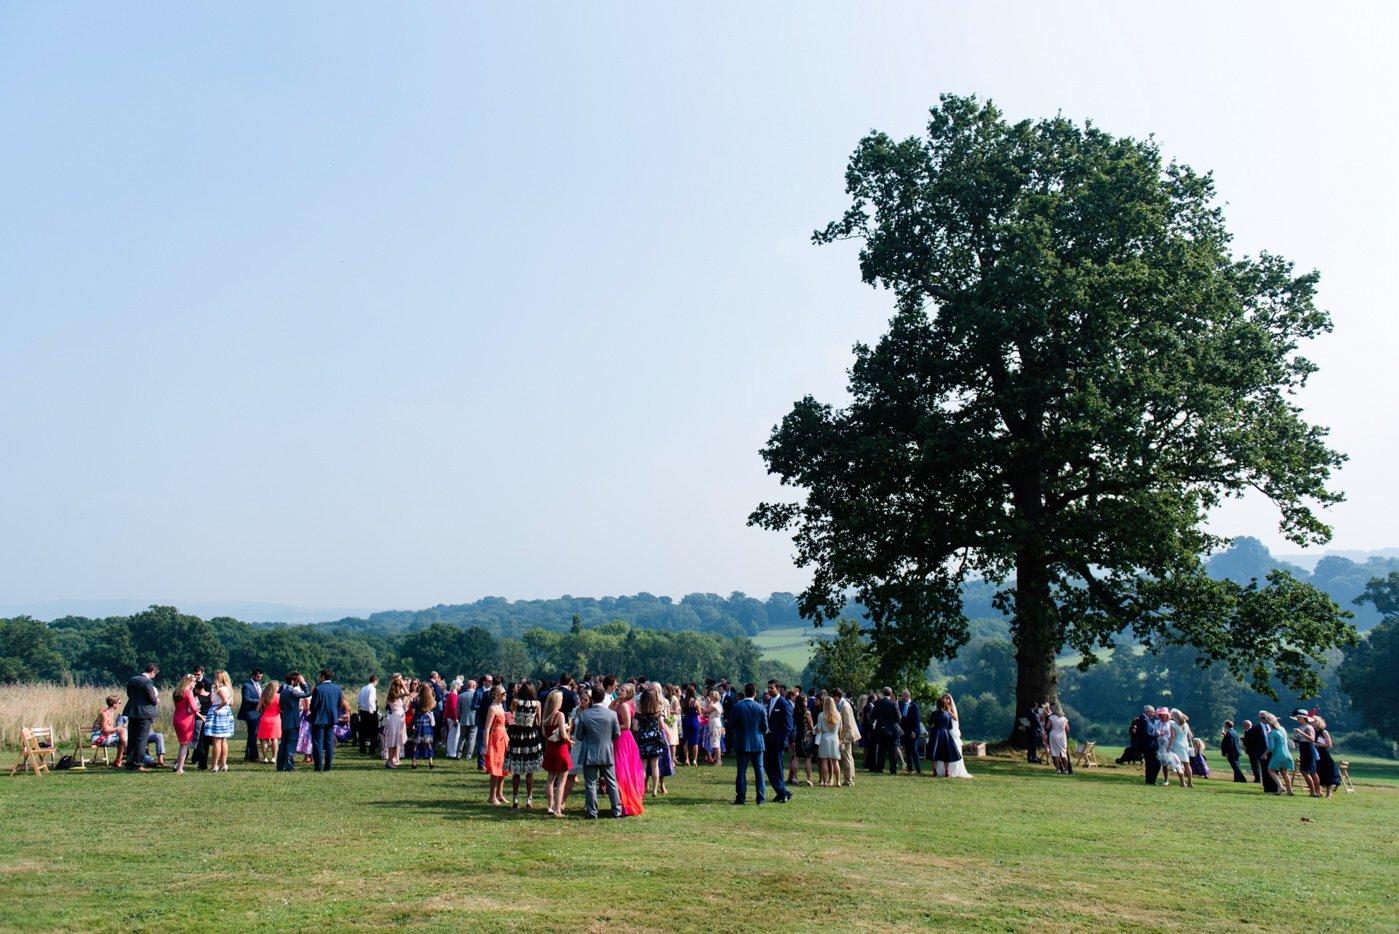 bignor-park-wedding-photography-robyn-and-tom-72